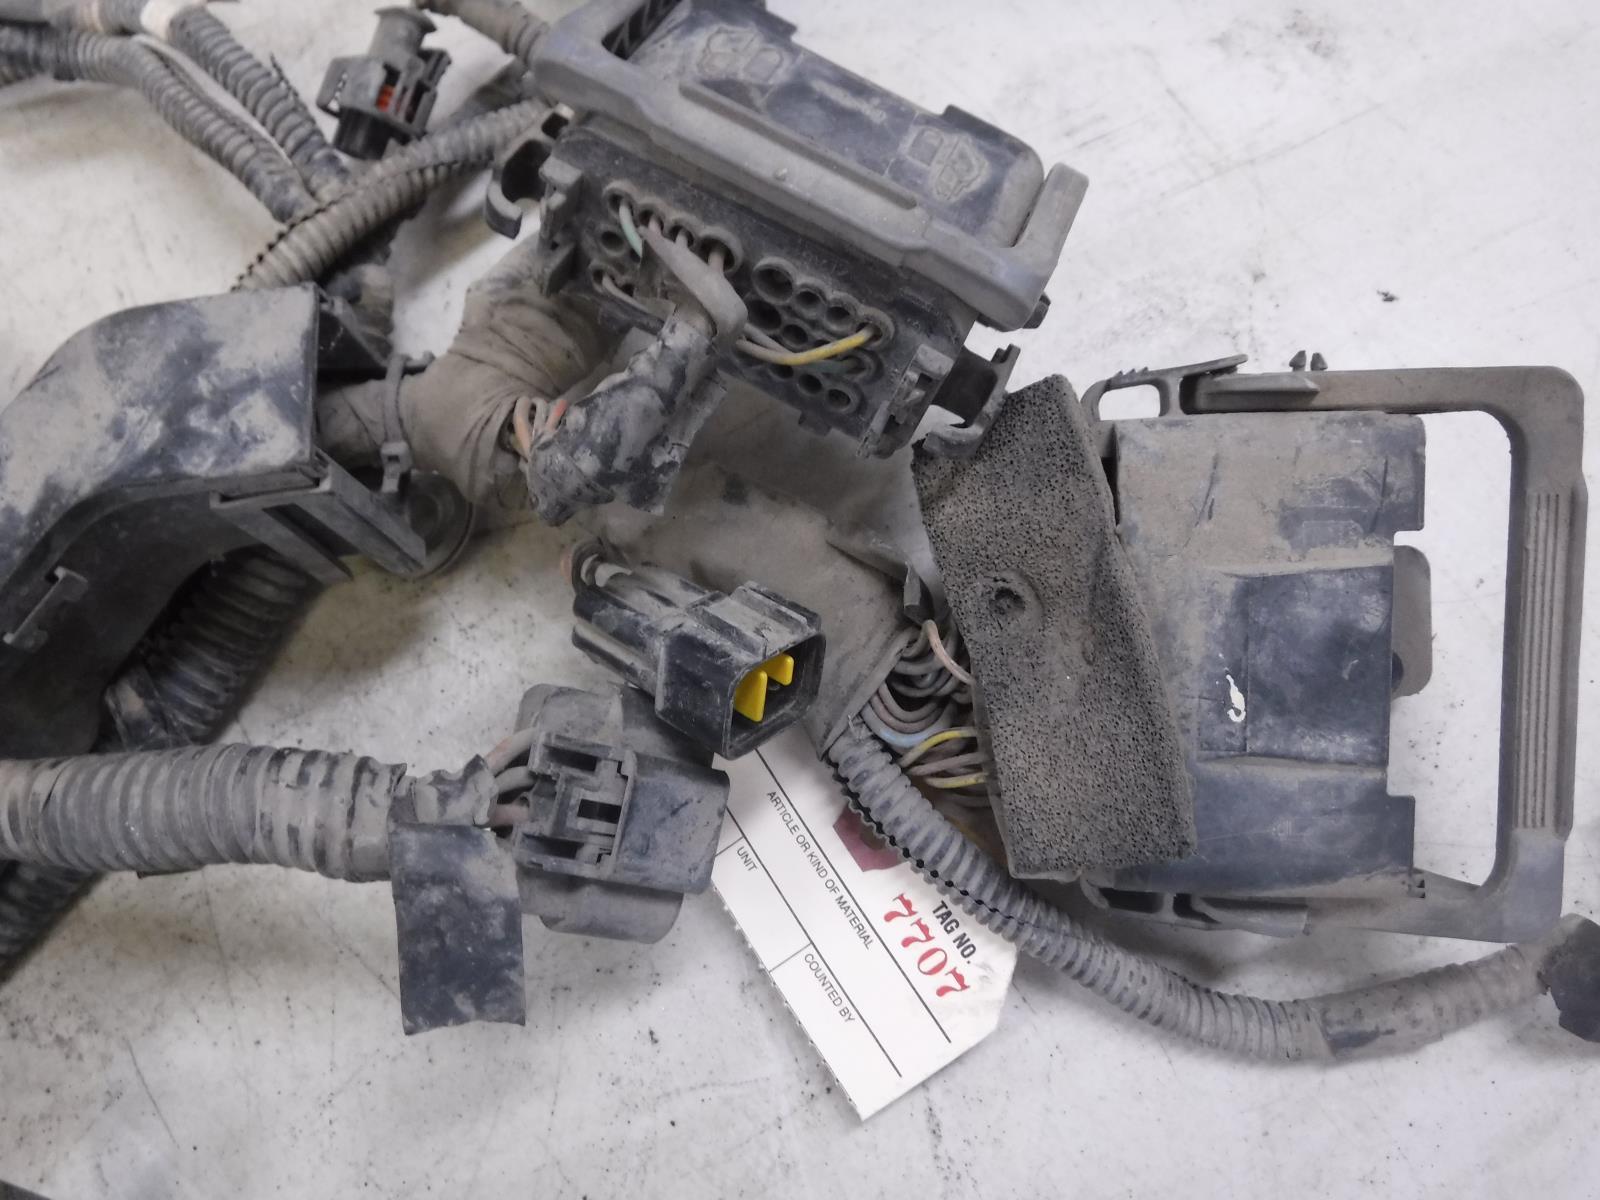 hight resolution of 2001 2002 2003 chevrolet 6 6 duramax lb7 engine wiring harness lb7 wiring harness lb7 wiring